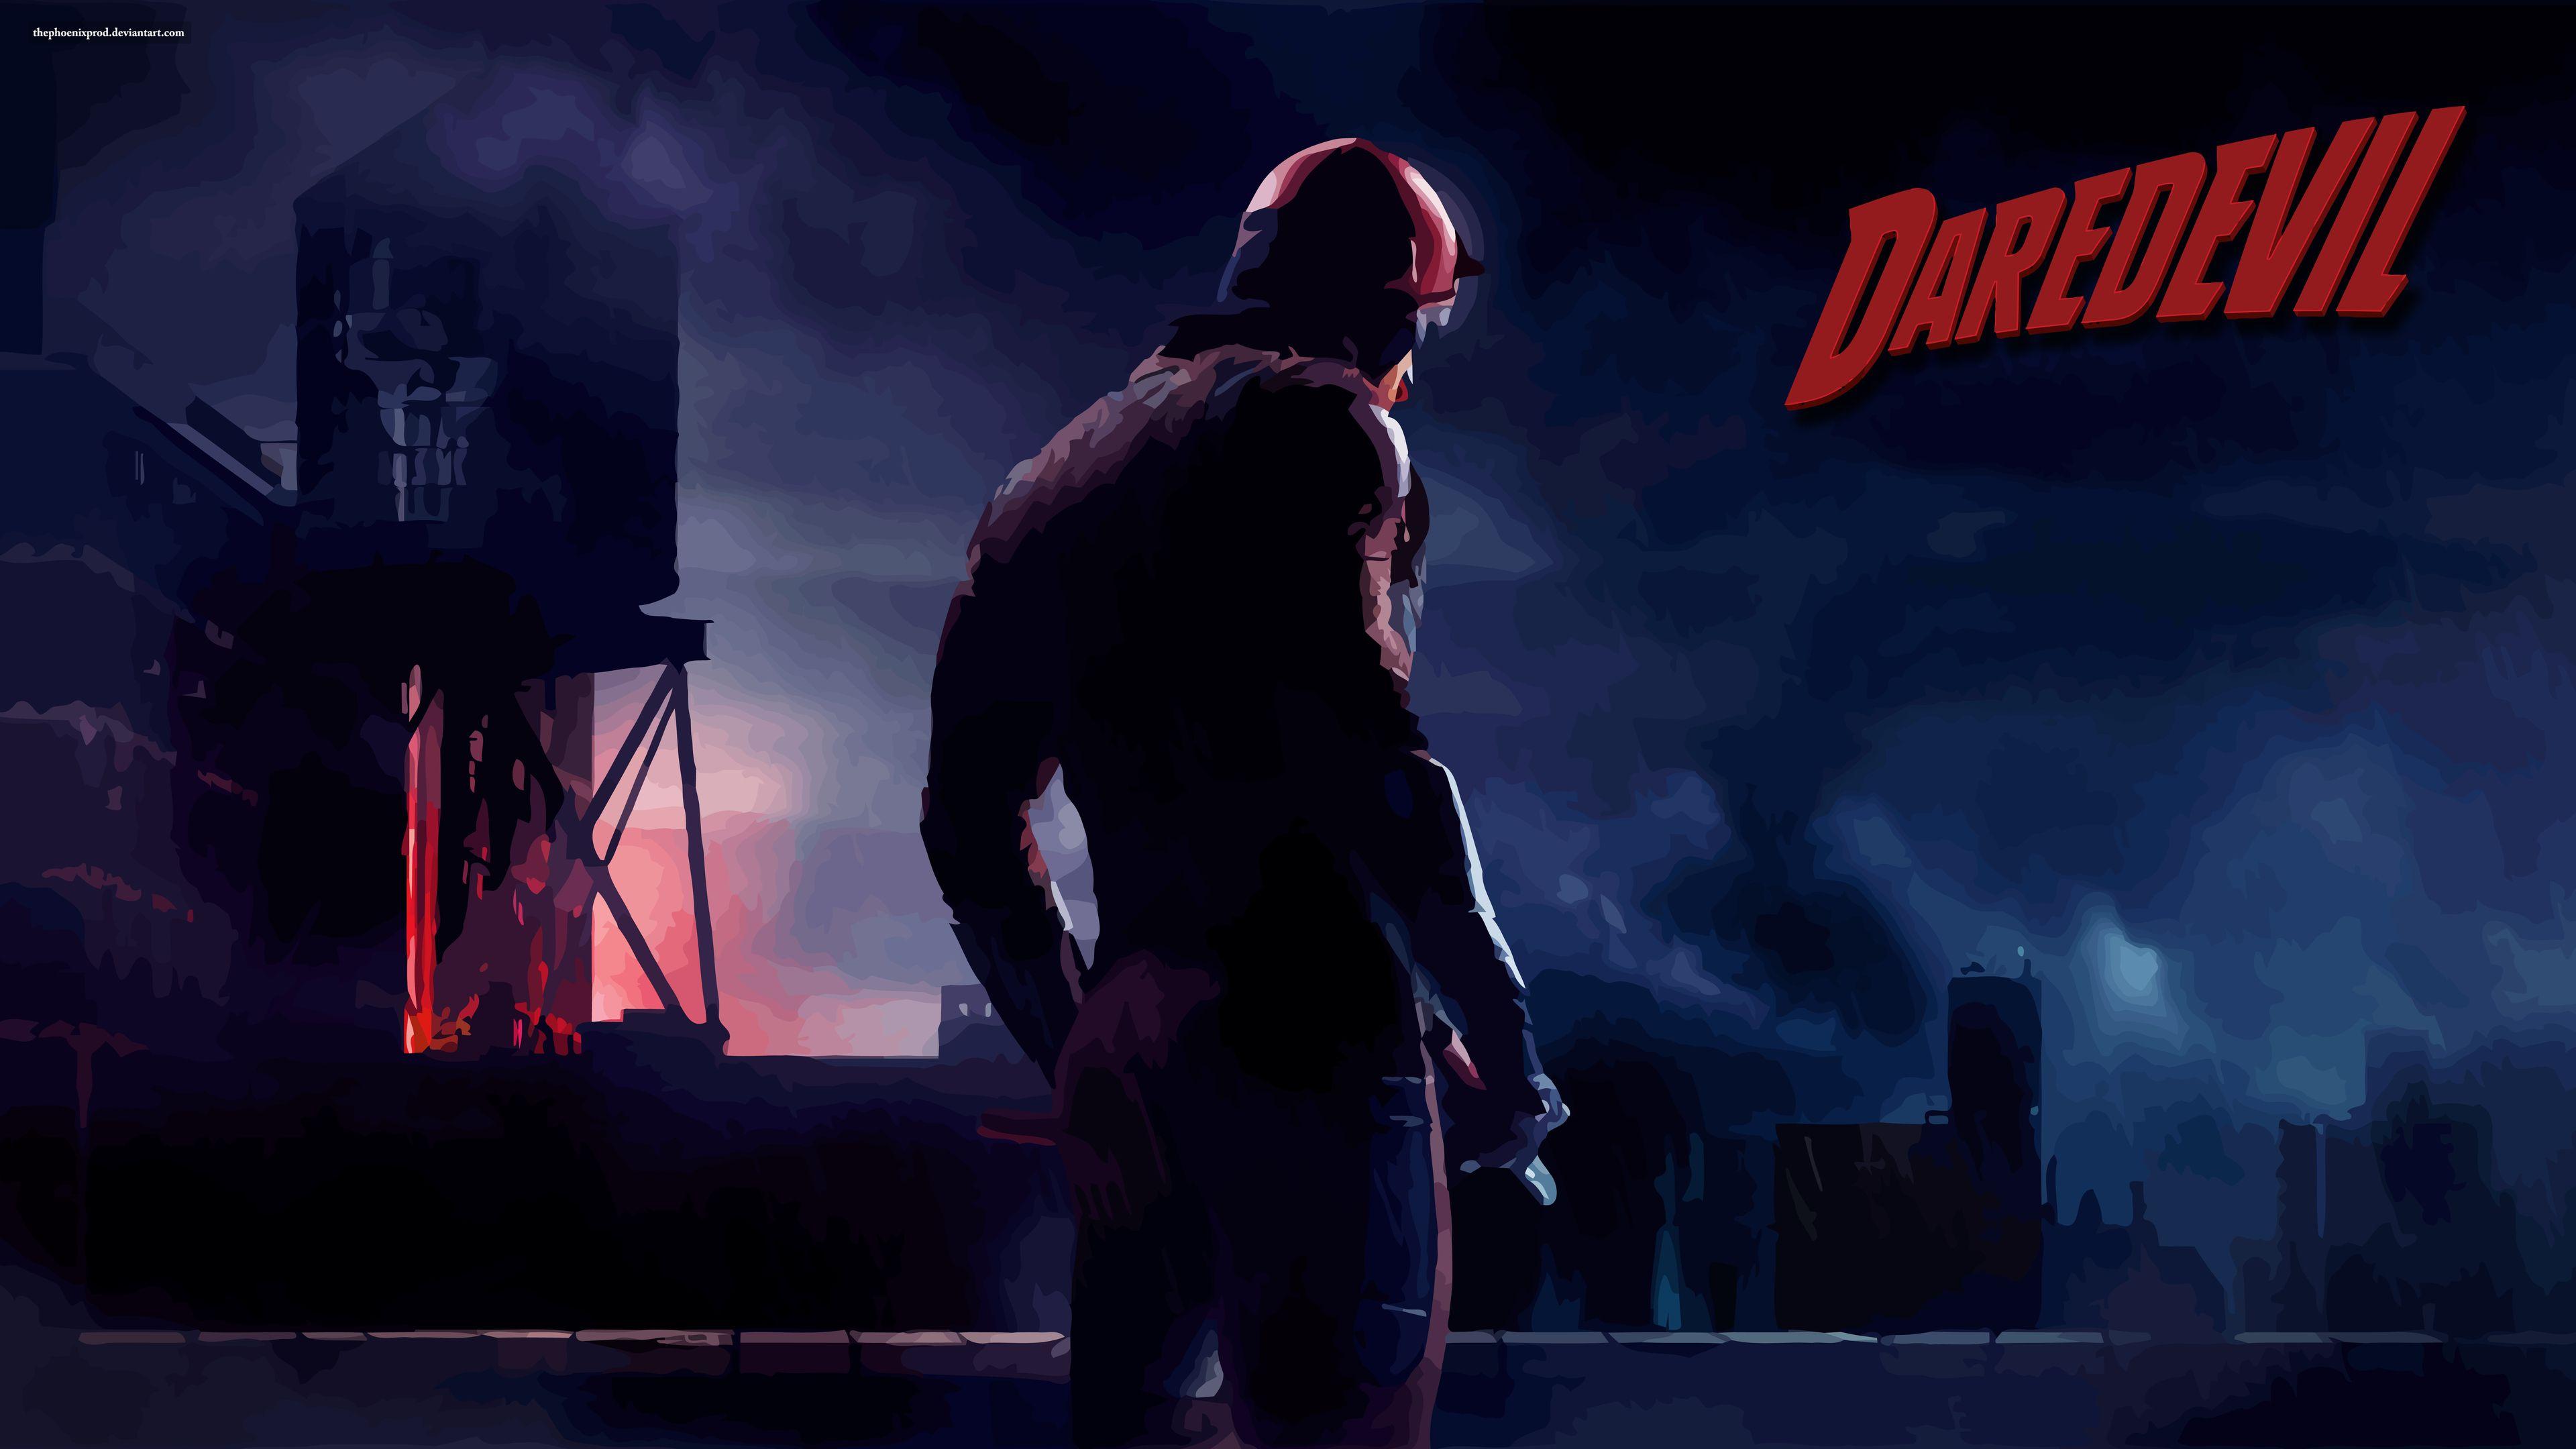 Daredevil 4k Artwork Tv Shows Wallpapers The Defenders